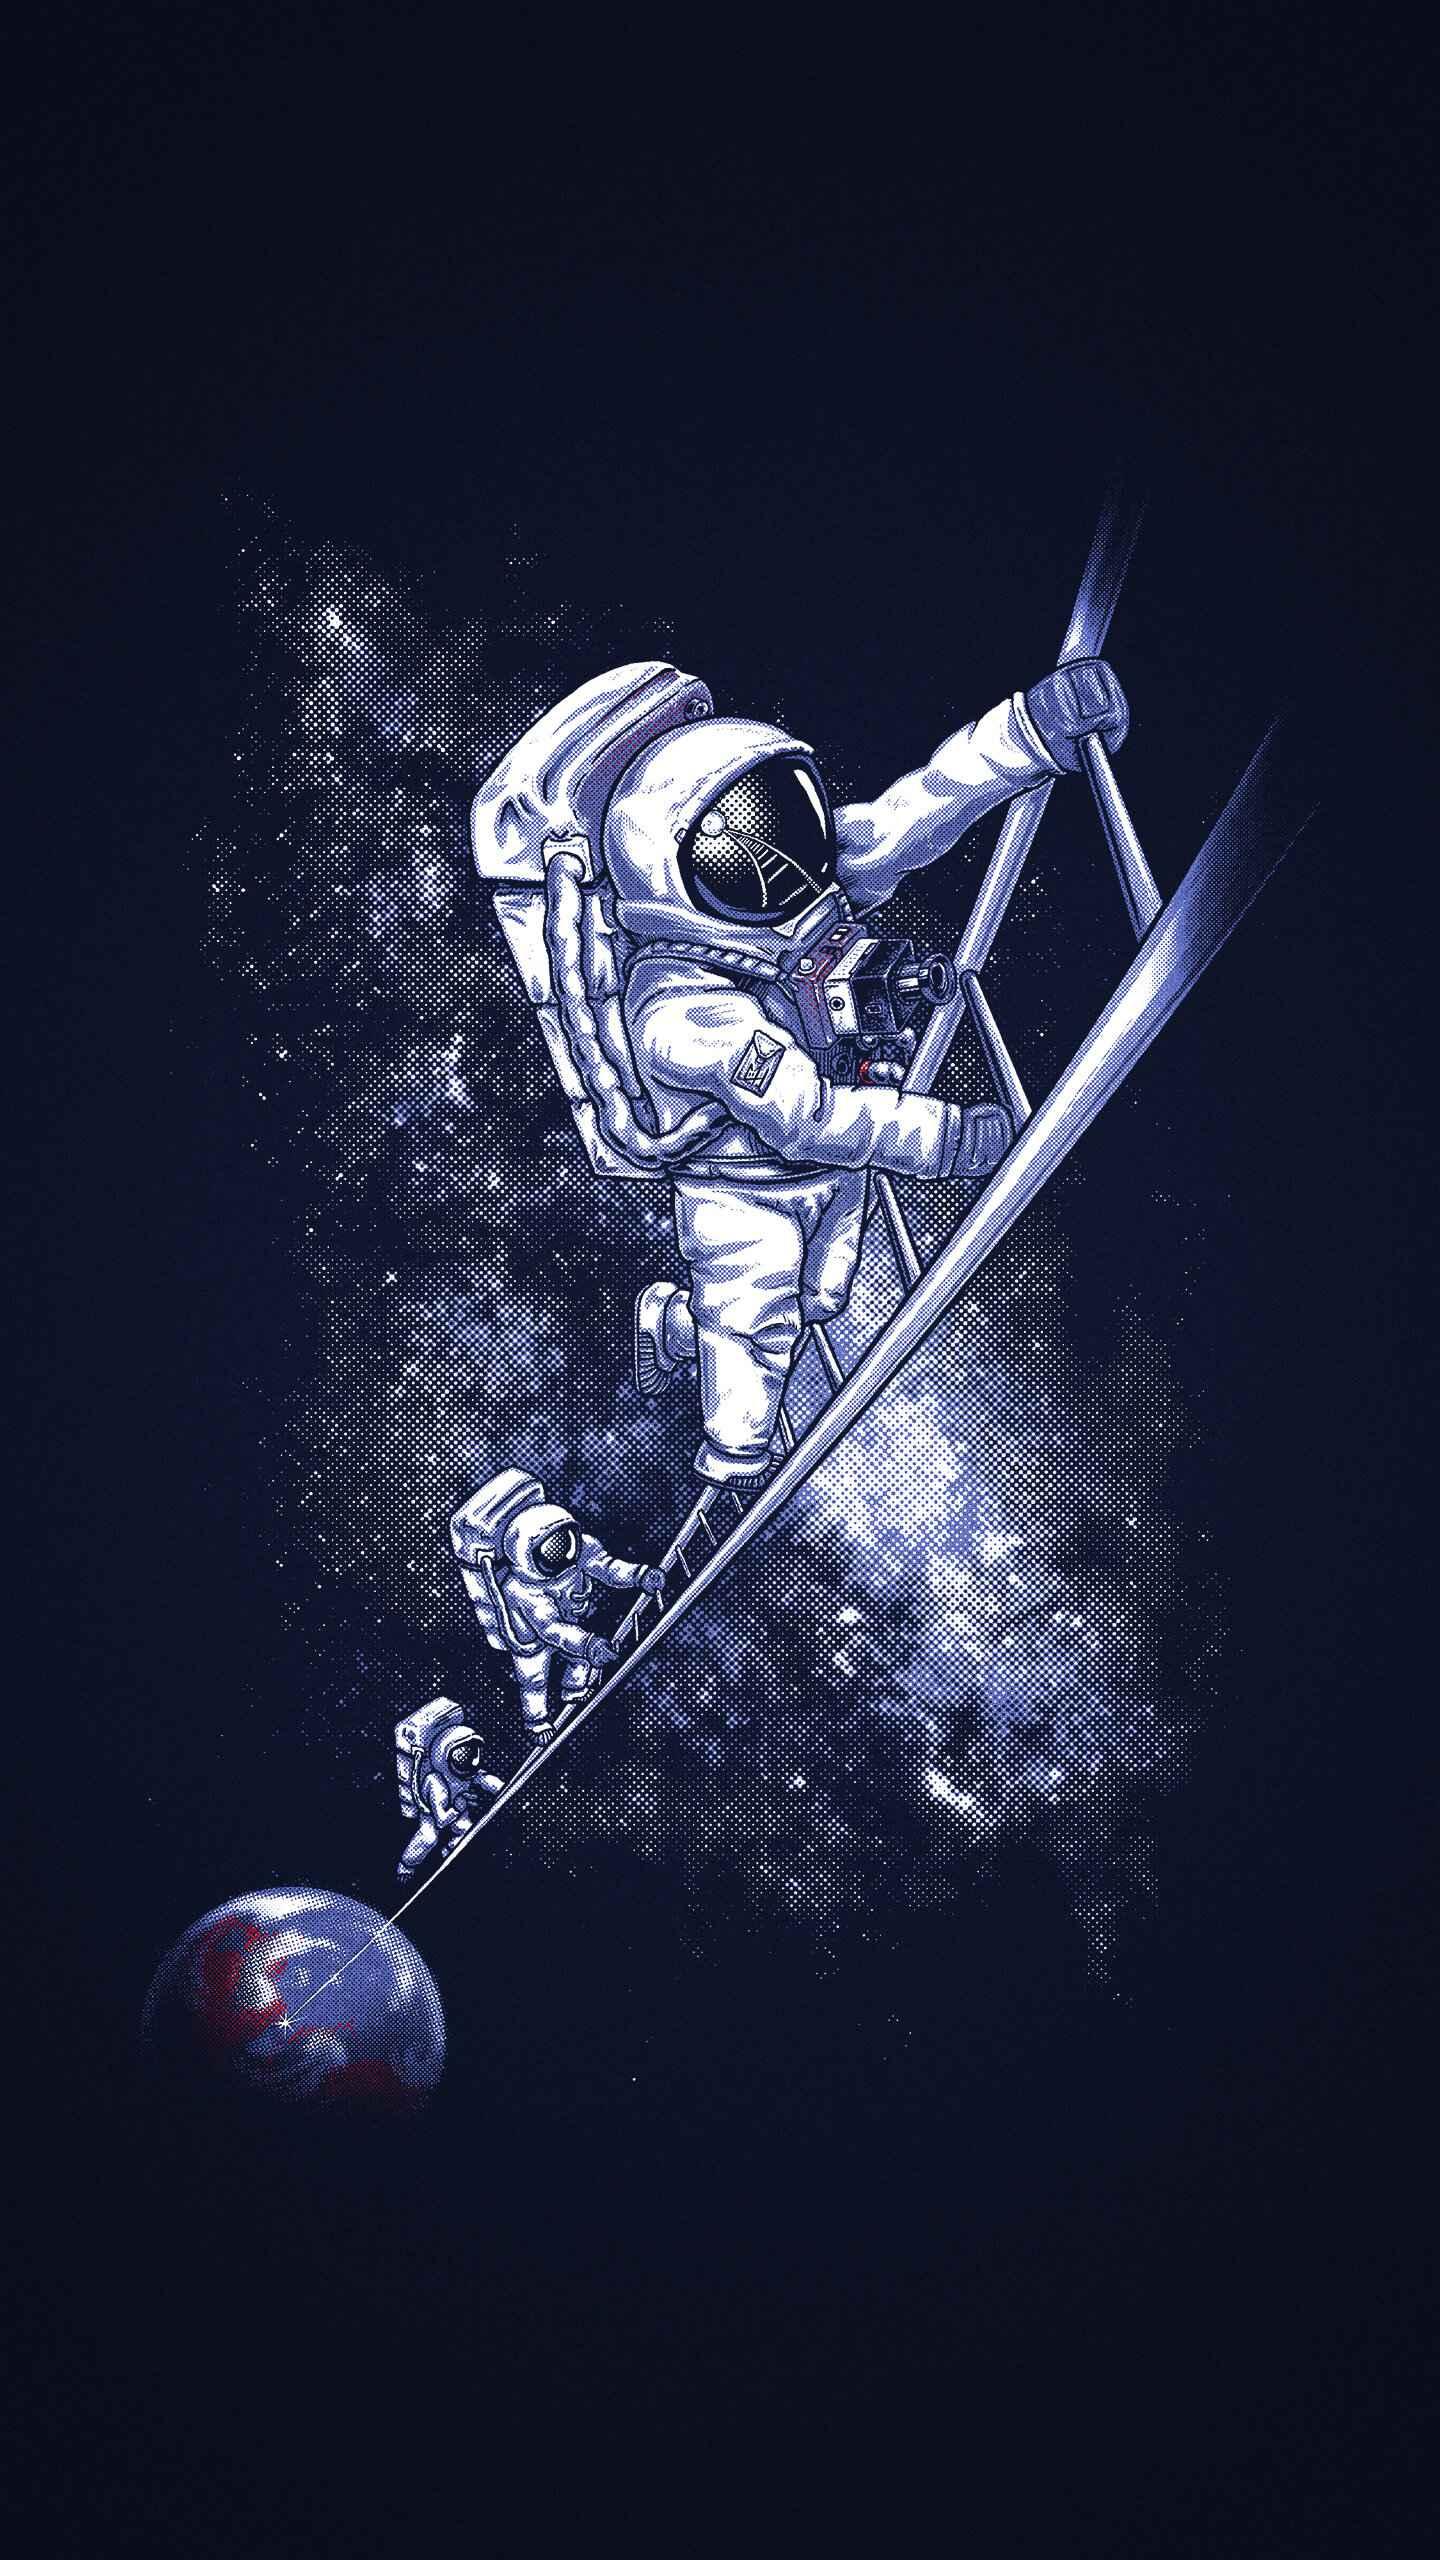 Astronaut Space Ladder iPhone Wallpaper